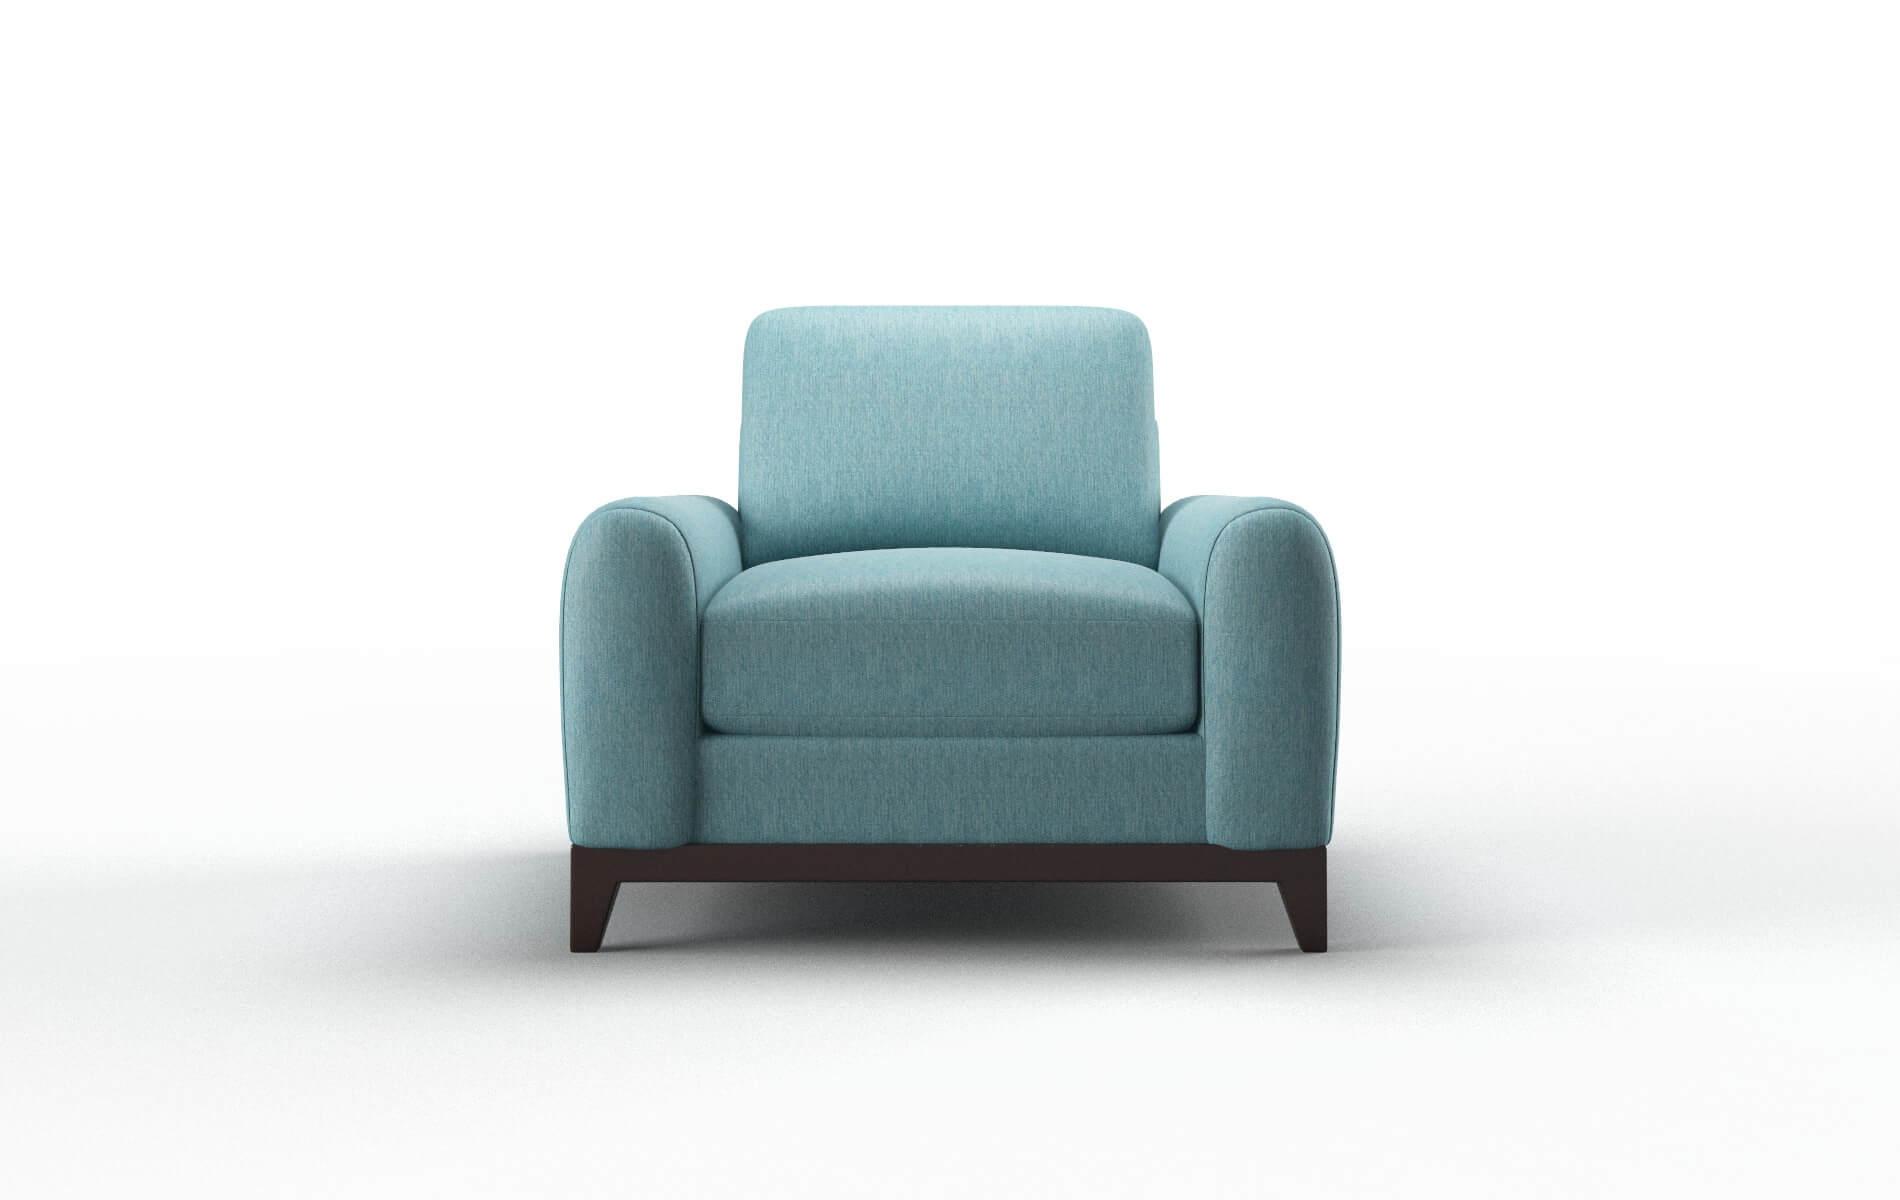 Mykonos Cosmo Turquoise Chair espresso legs 1